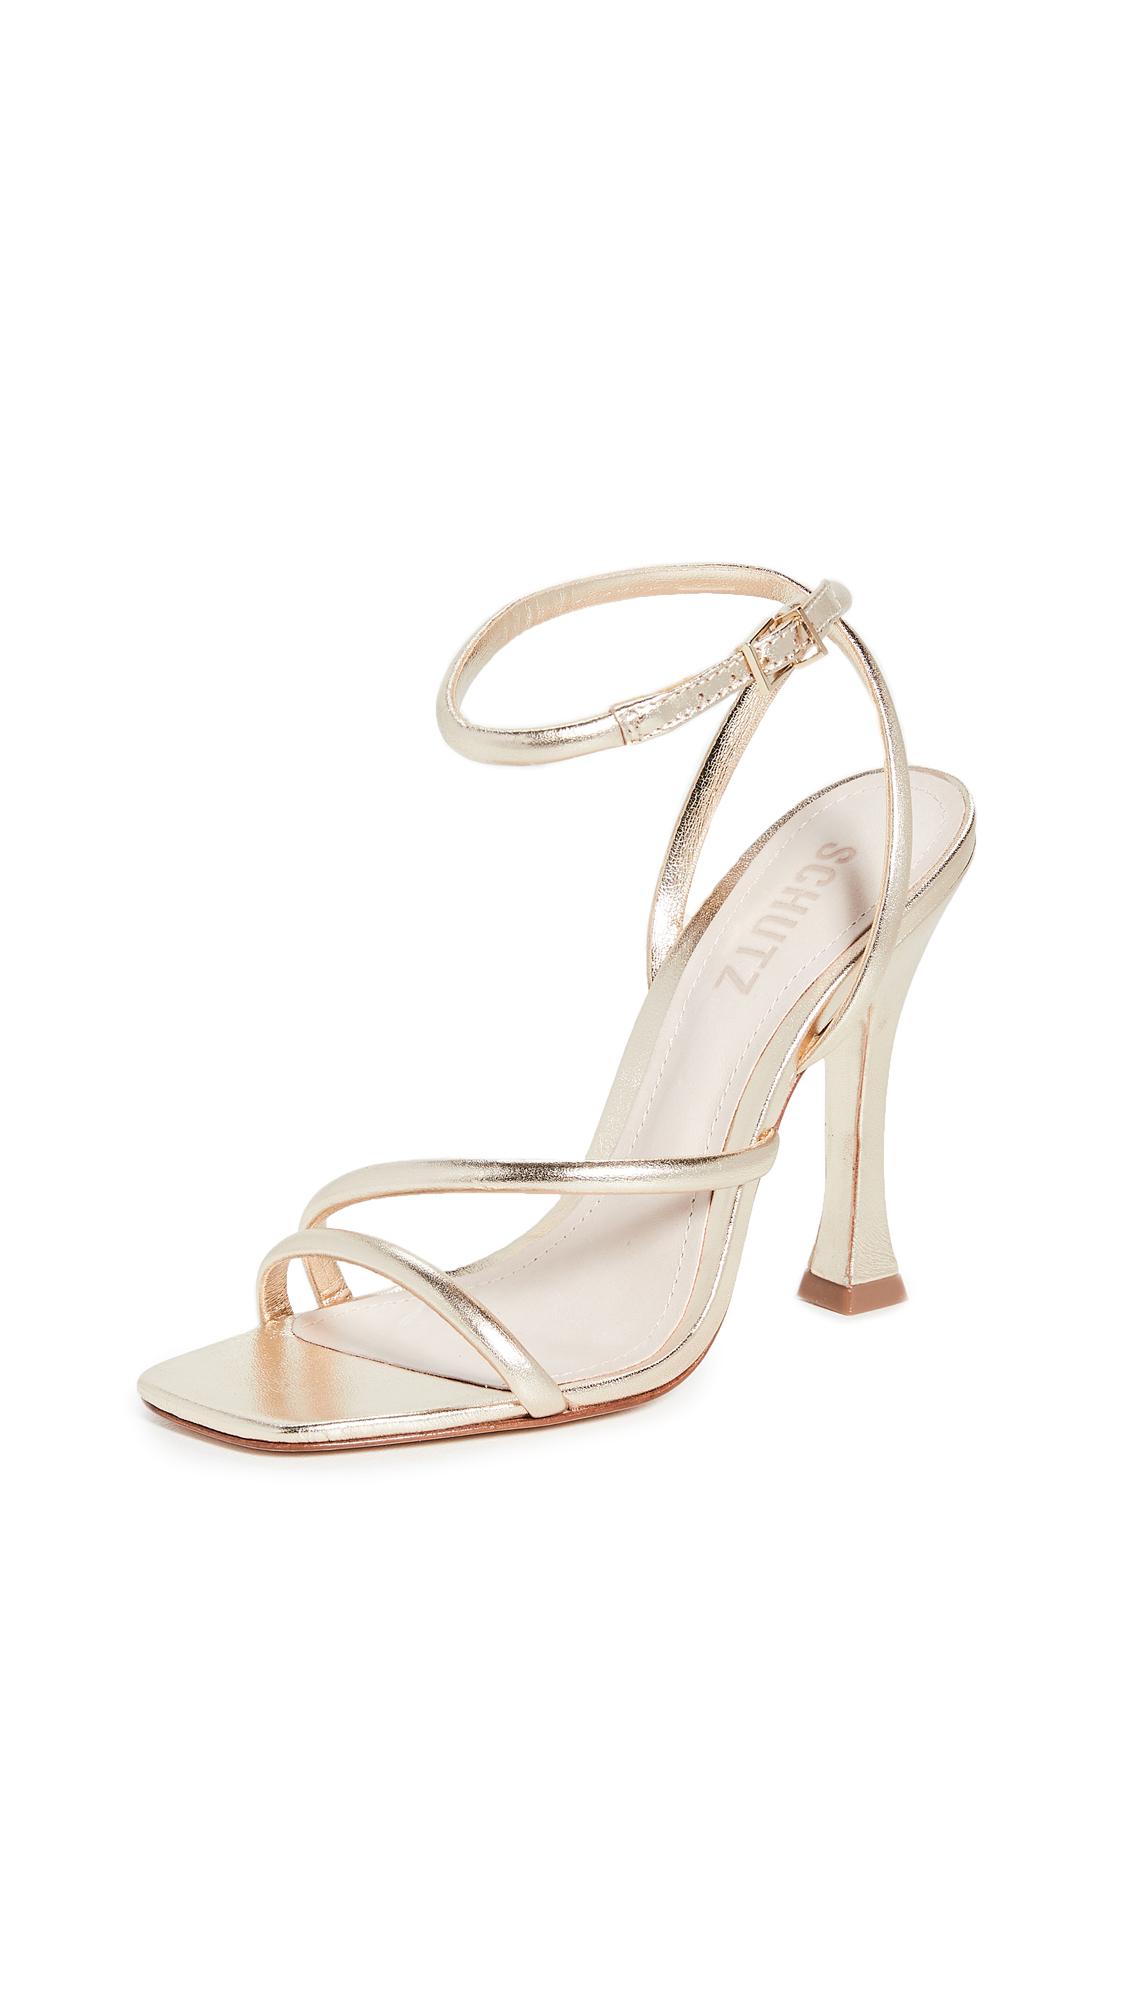 Buy Schutz Polaina Sandals online, shop Schutz